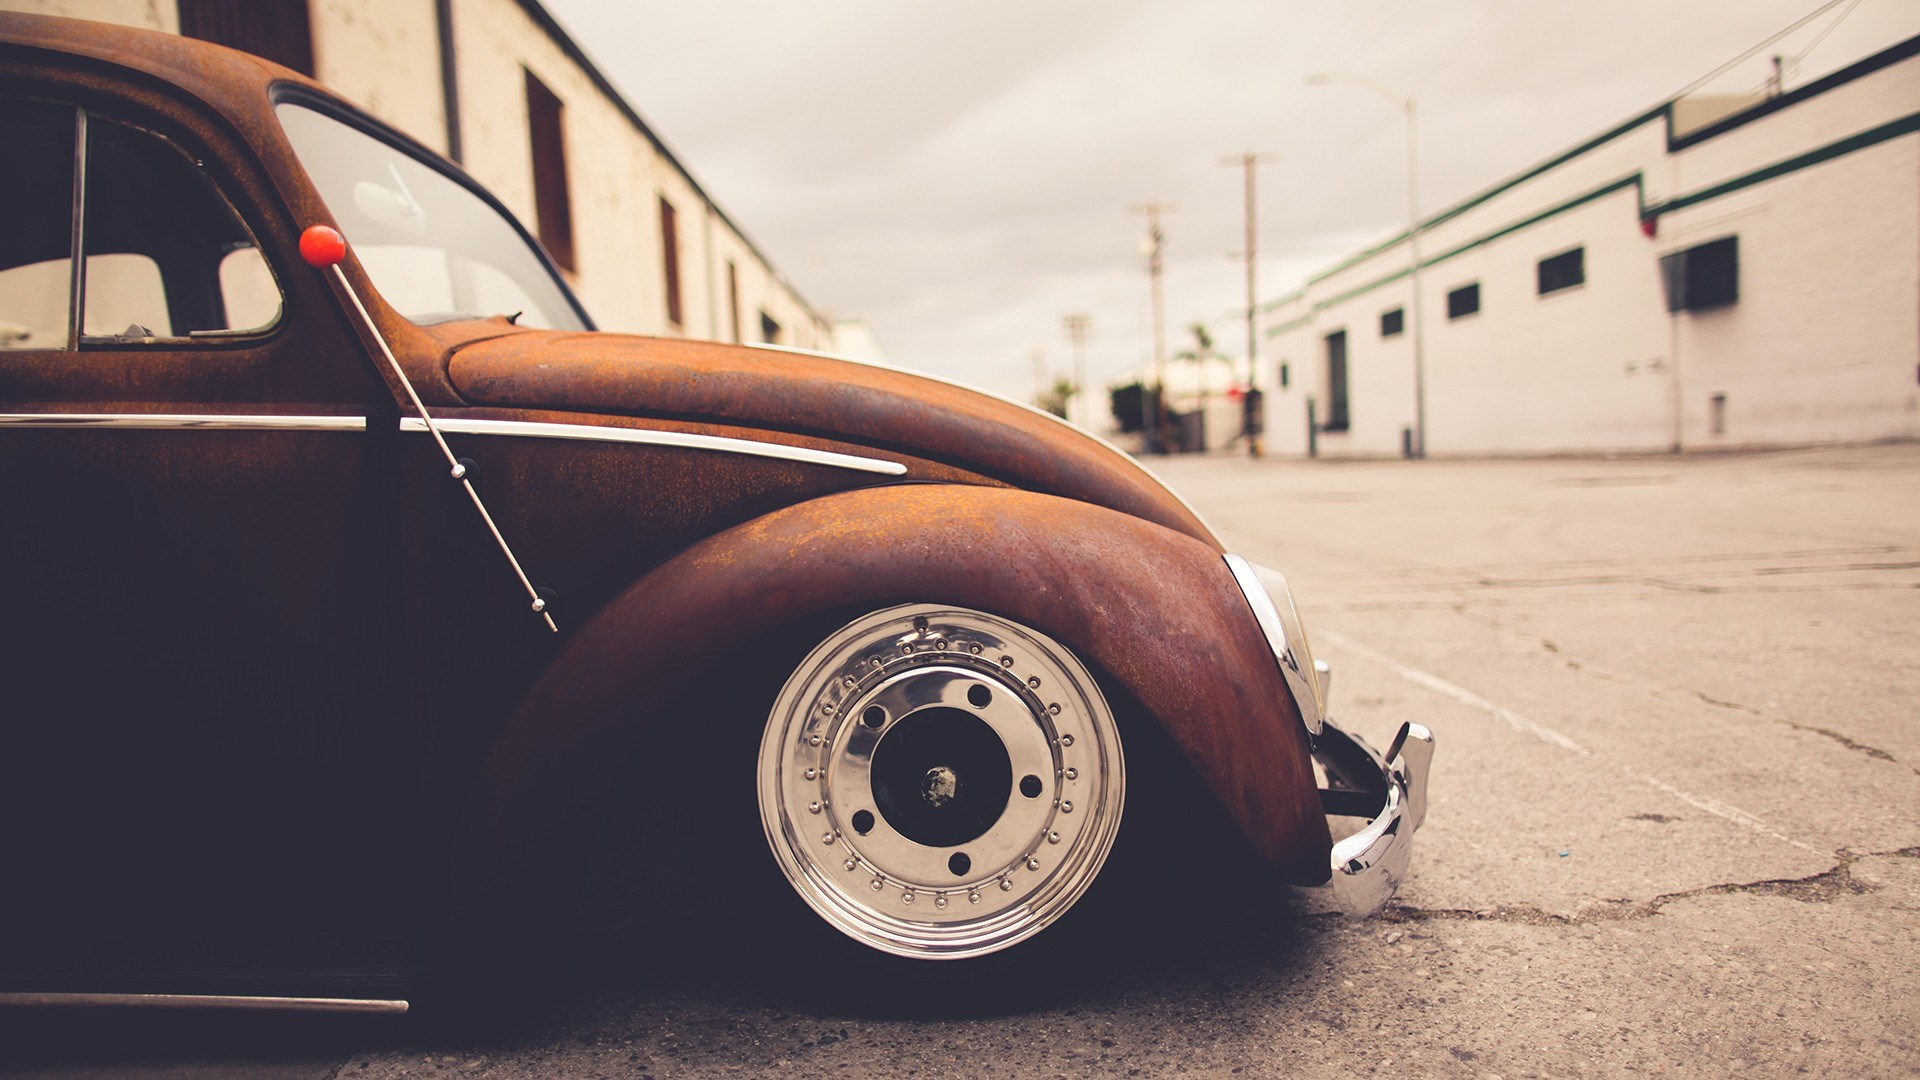 VW Volkswagen Beetle Bug wallpaper in Transportation wallpapers 1920x1080